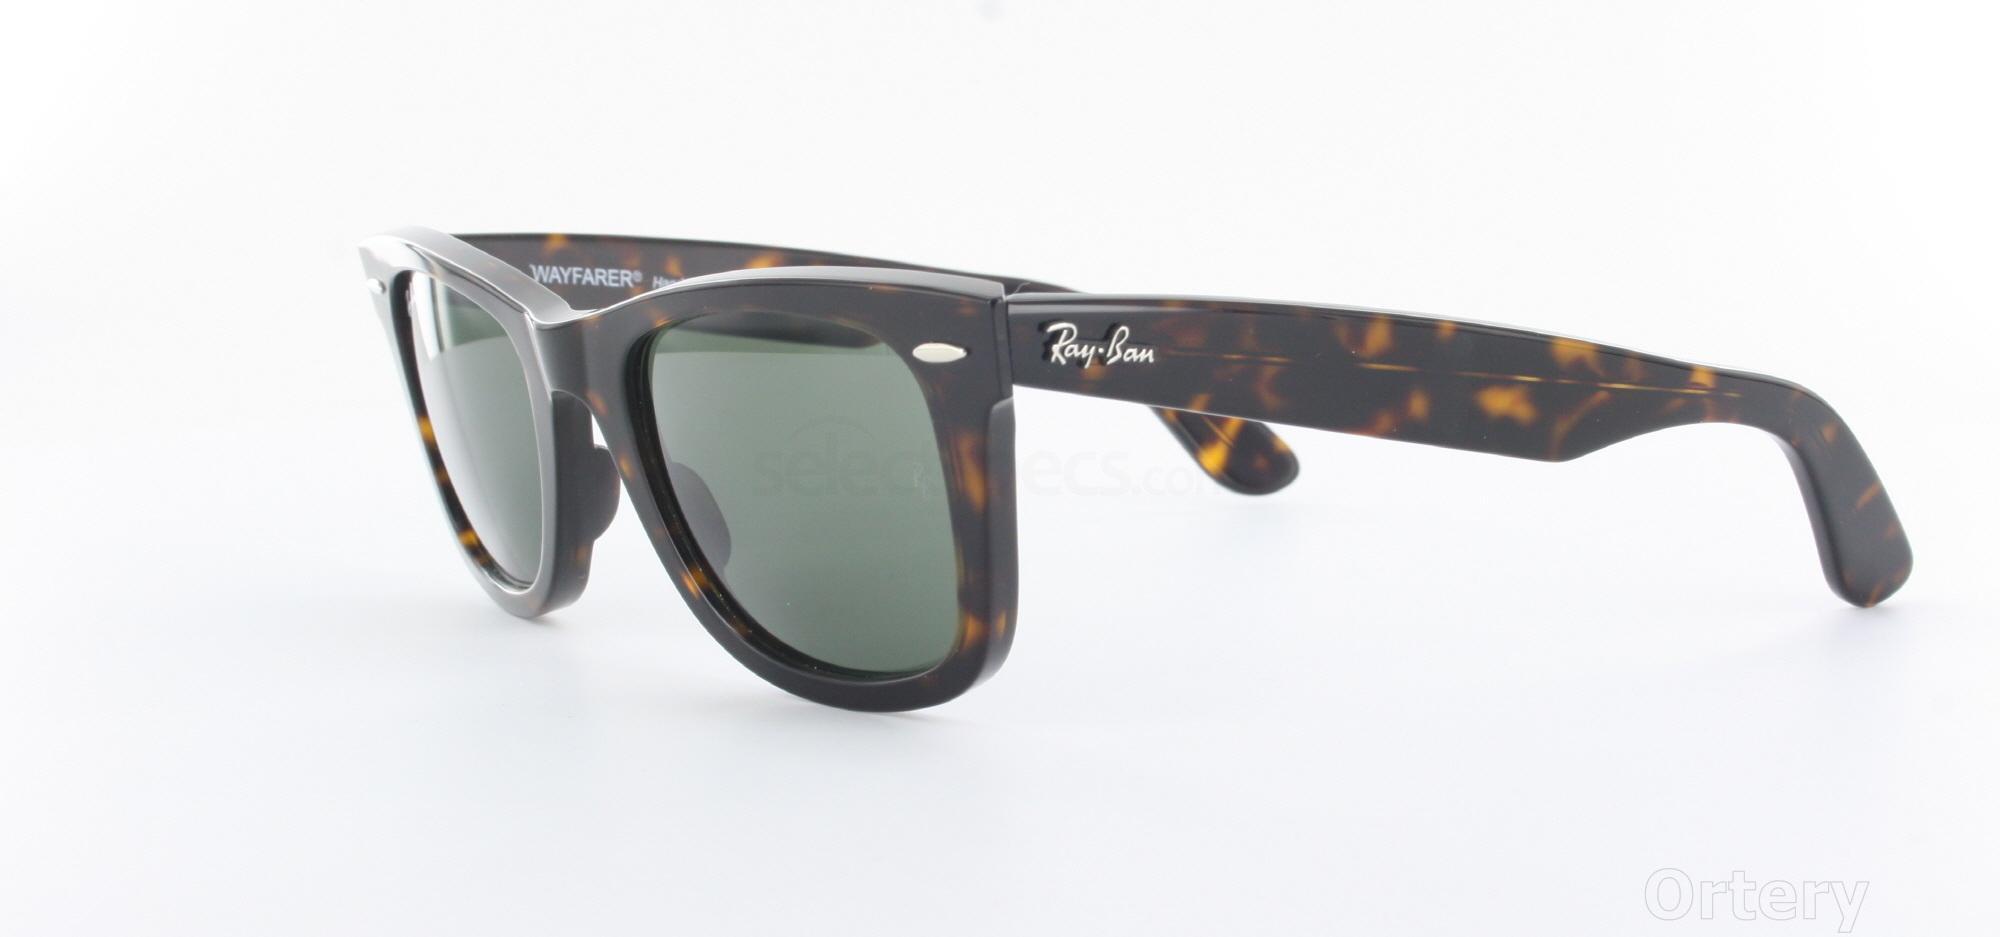 d26e70b89a5 Oakley Sunglasses Croakies